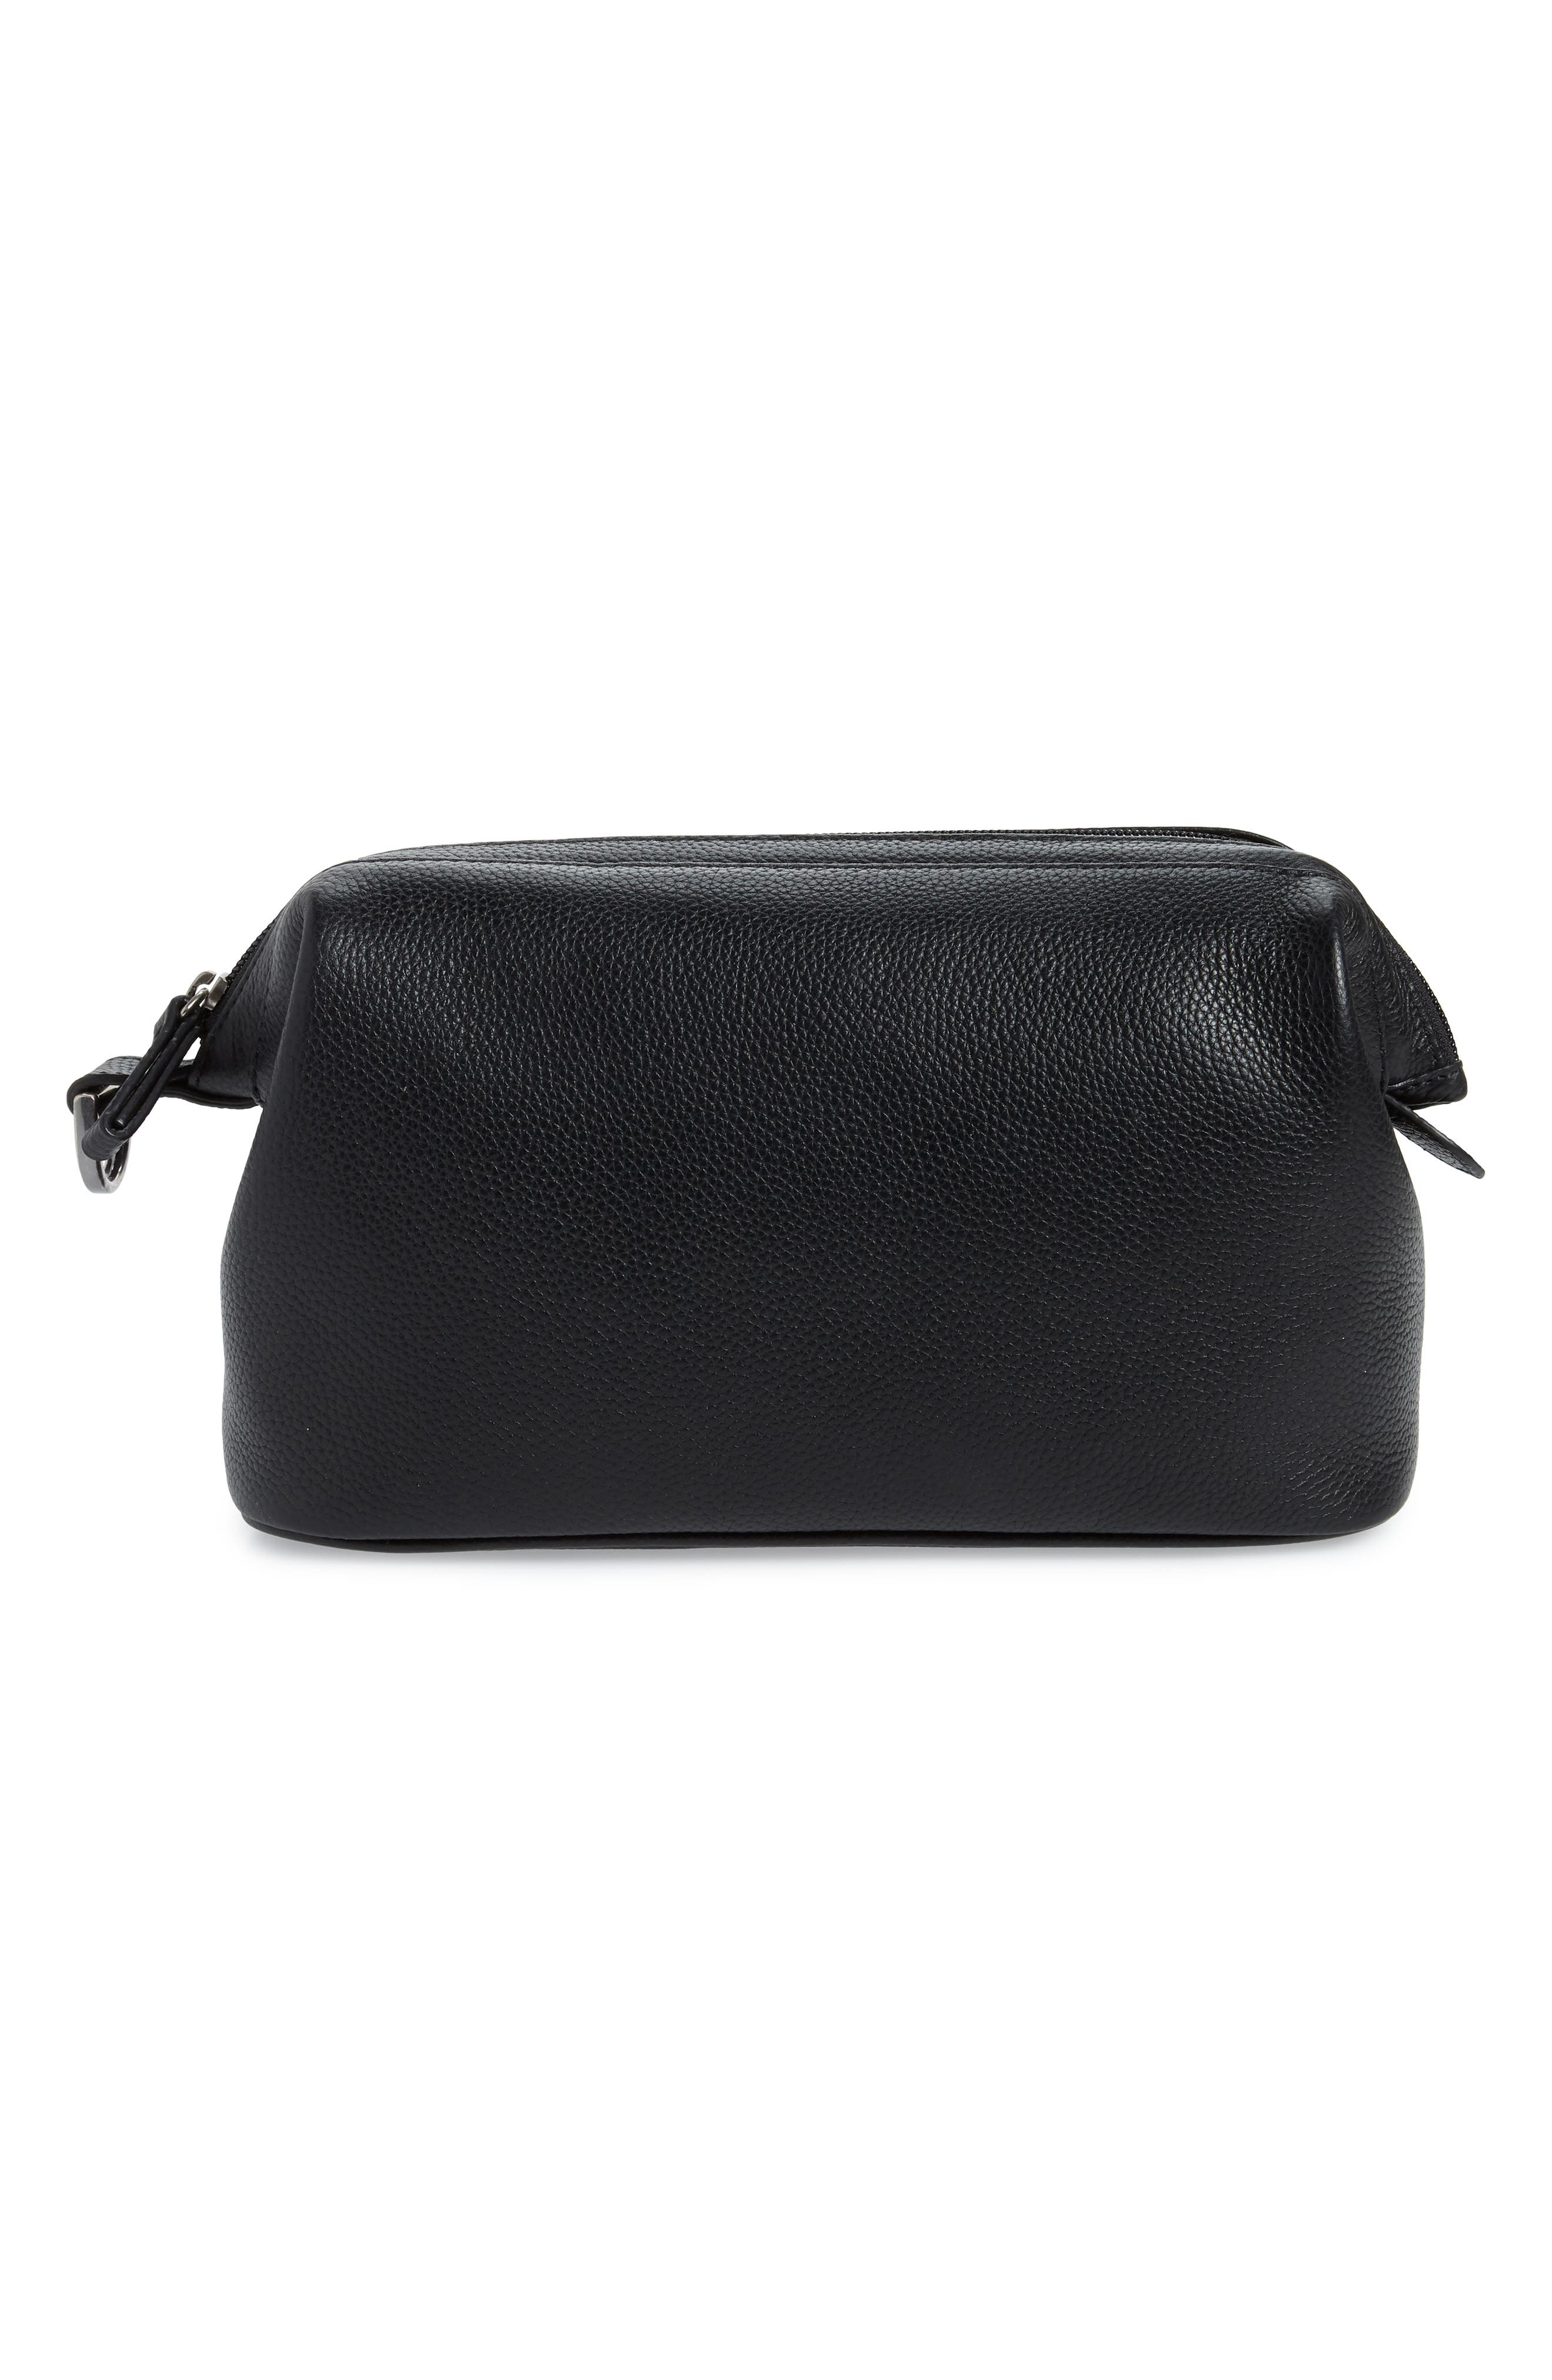 Midland Leather Dopp Kit,                         Main,                         color, BLACK